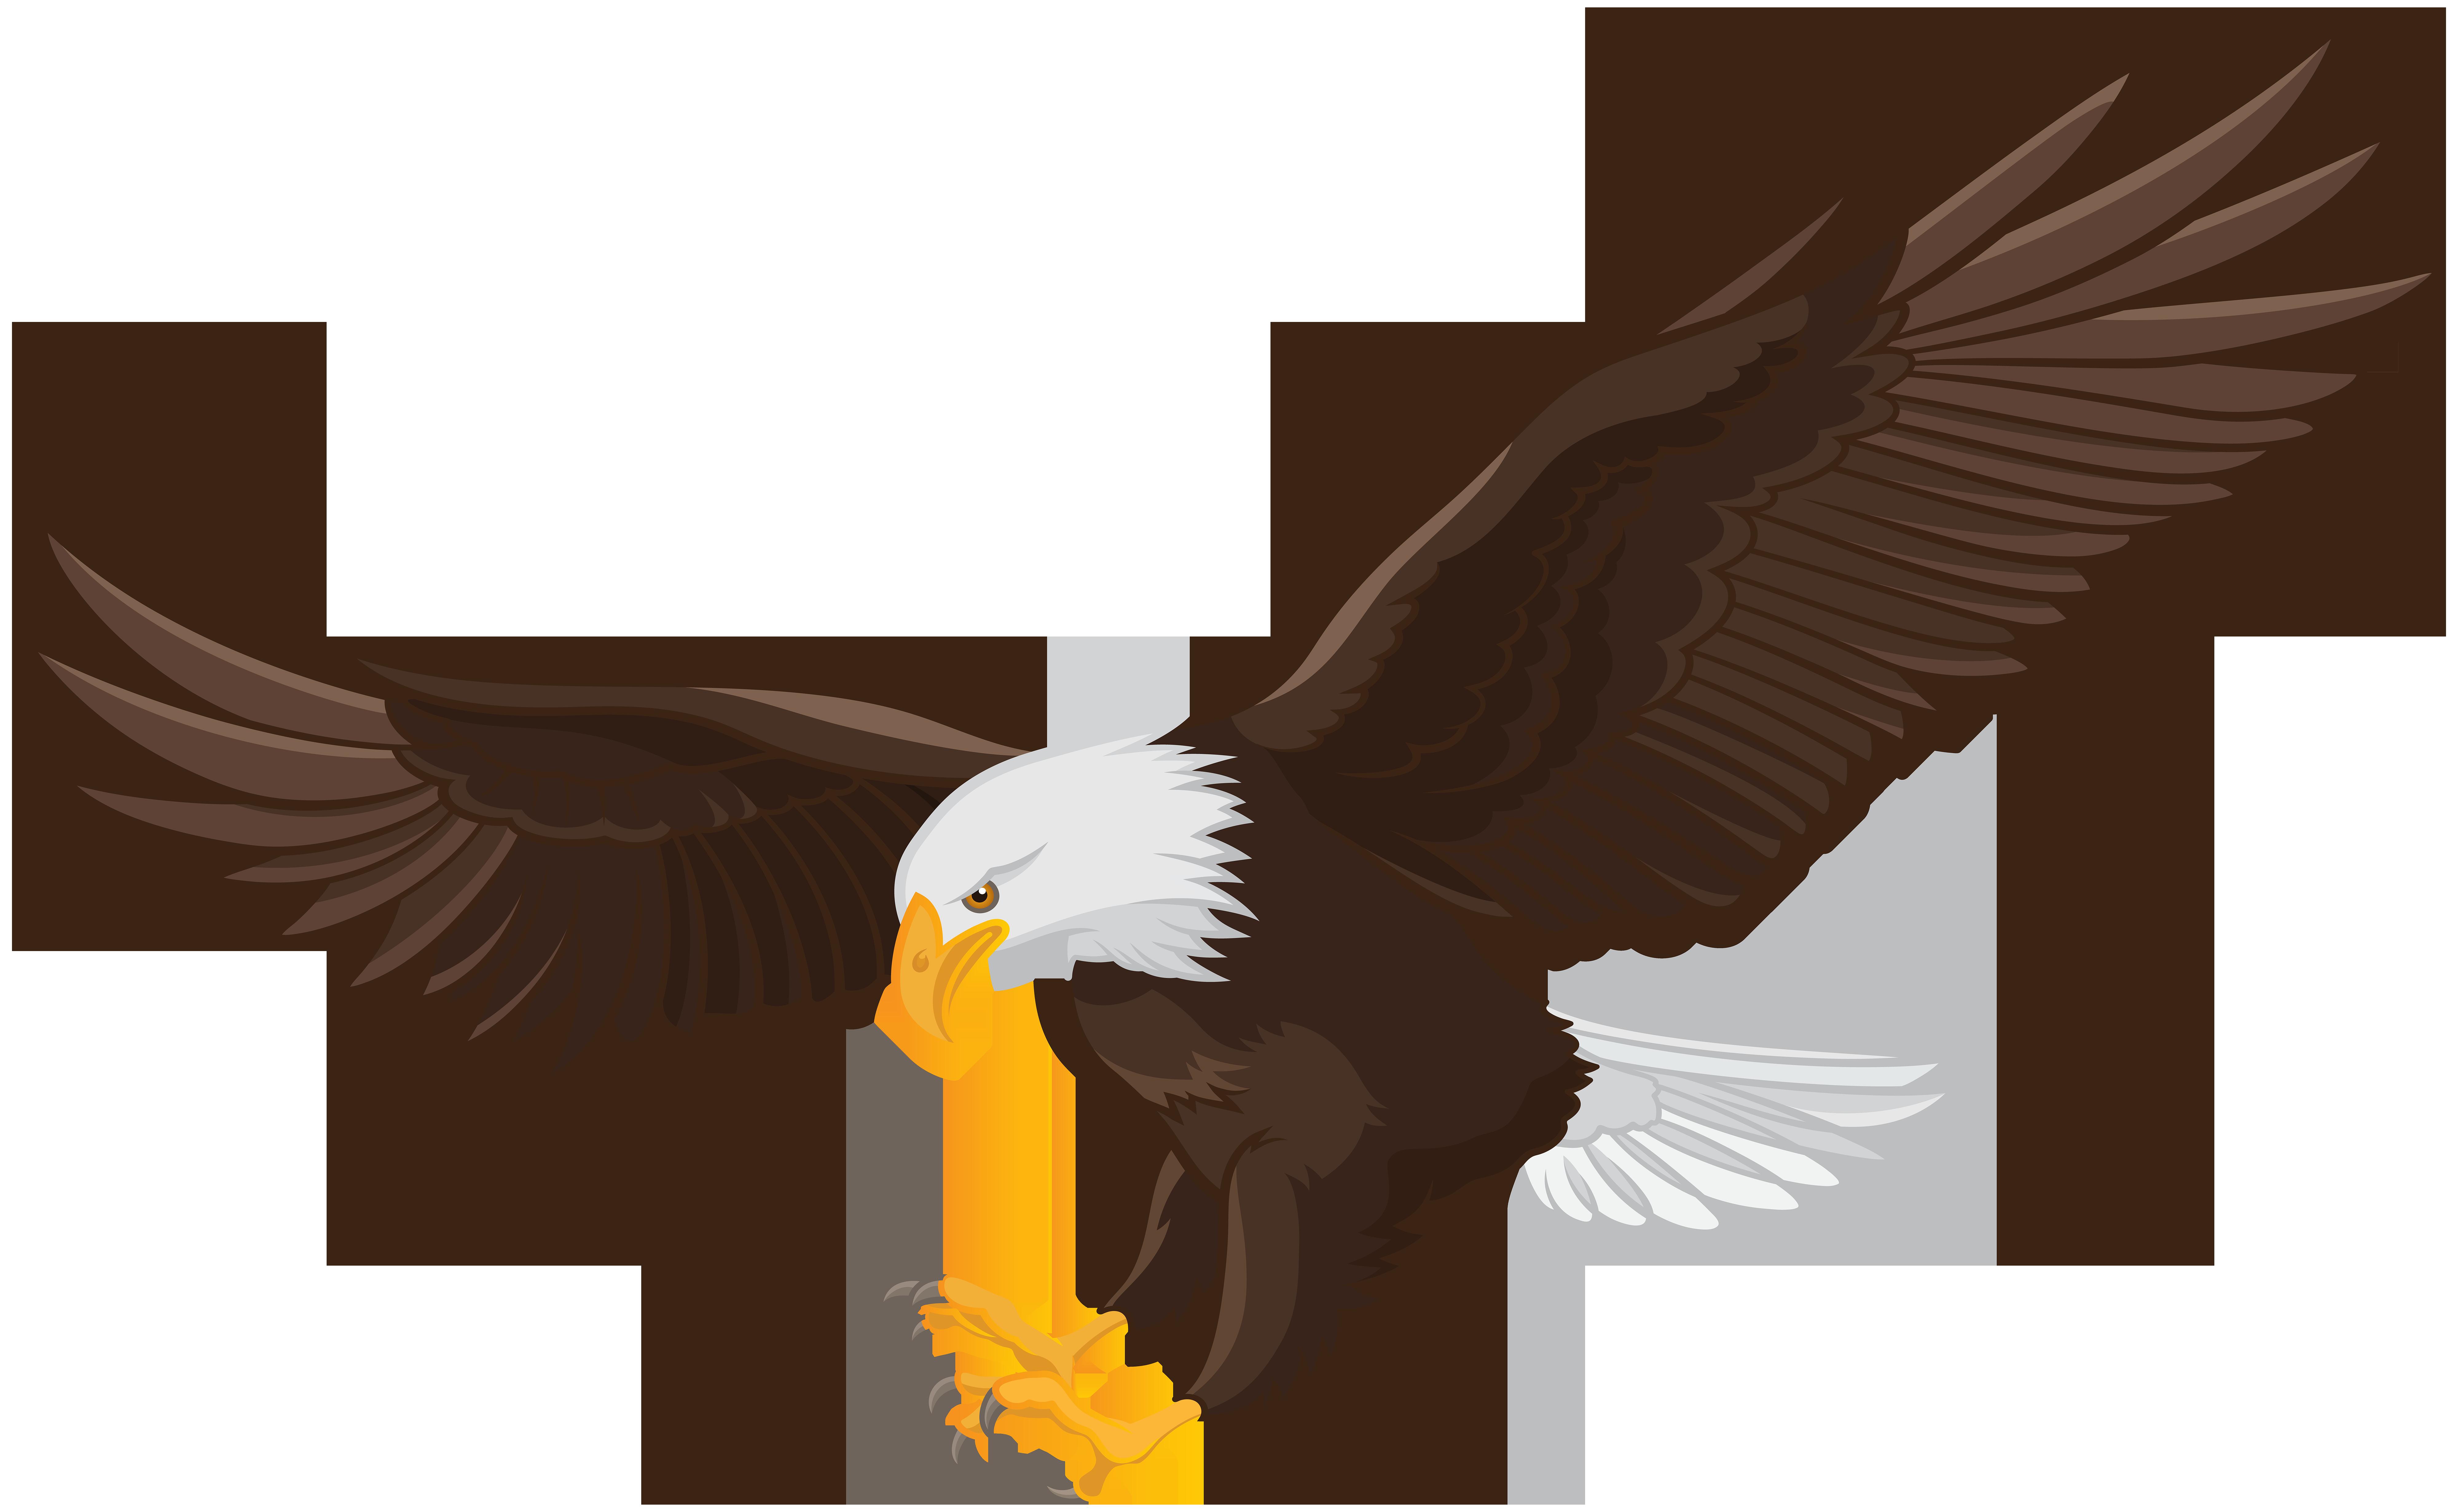 Eagle clipart dead, Eagle dead Transparent FREE for ...